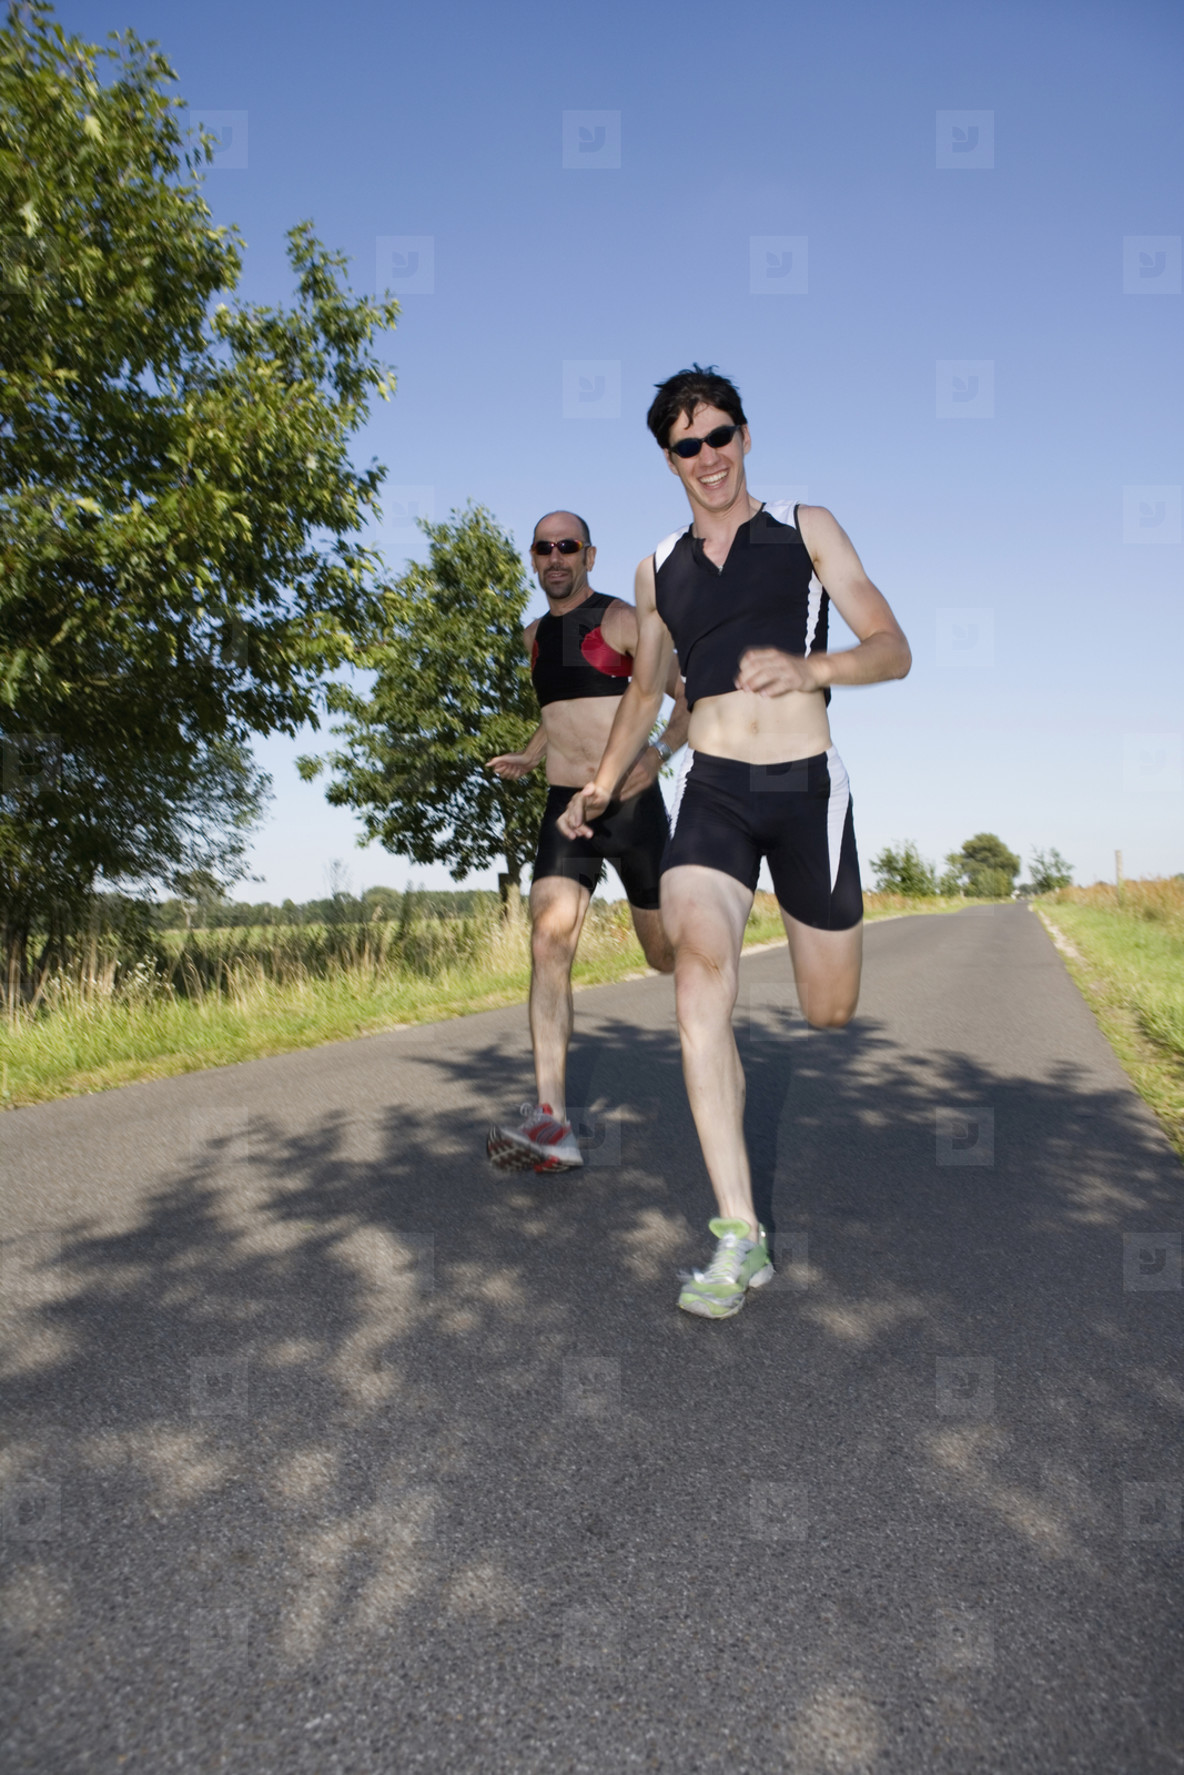 Scenes from a Triathlon  32